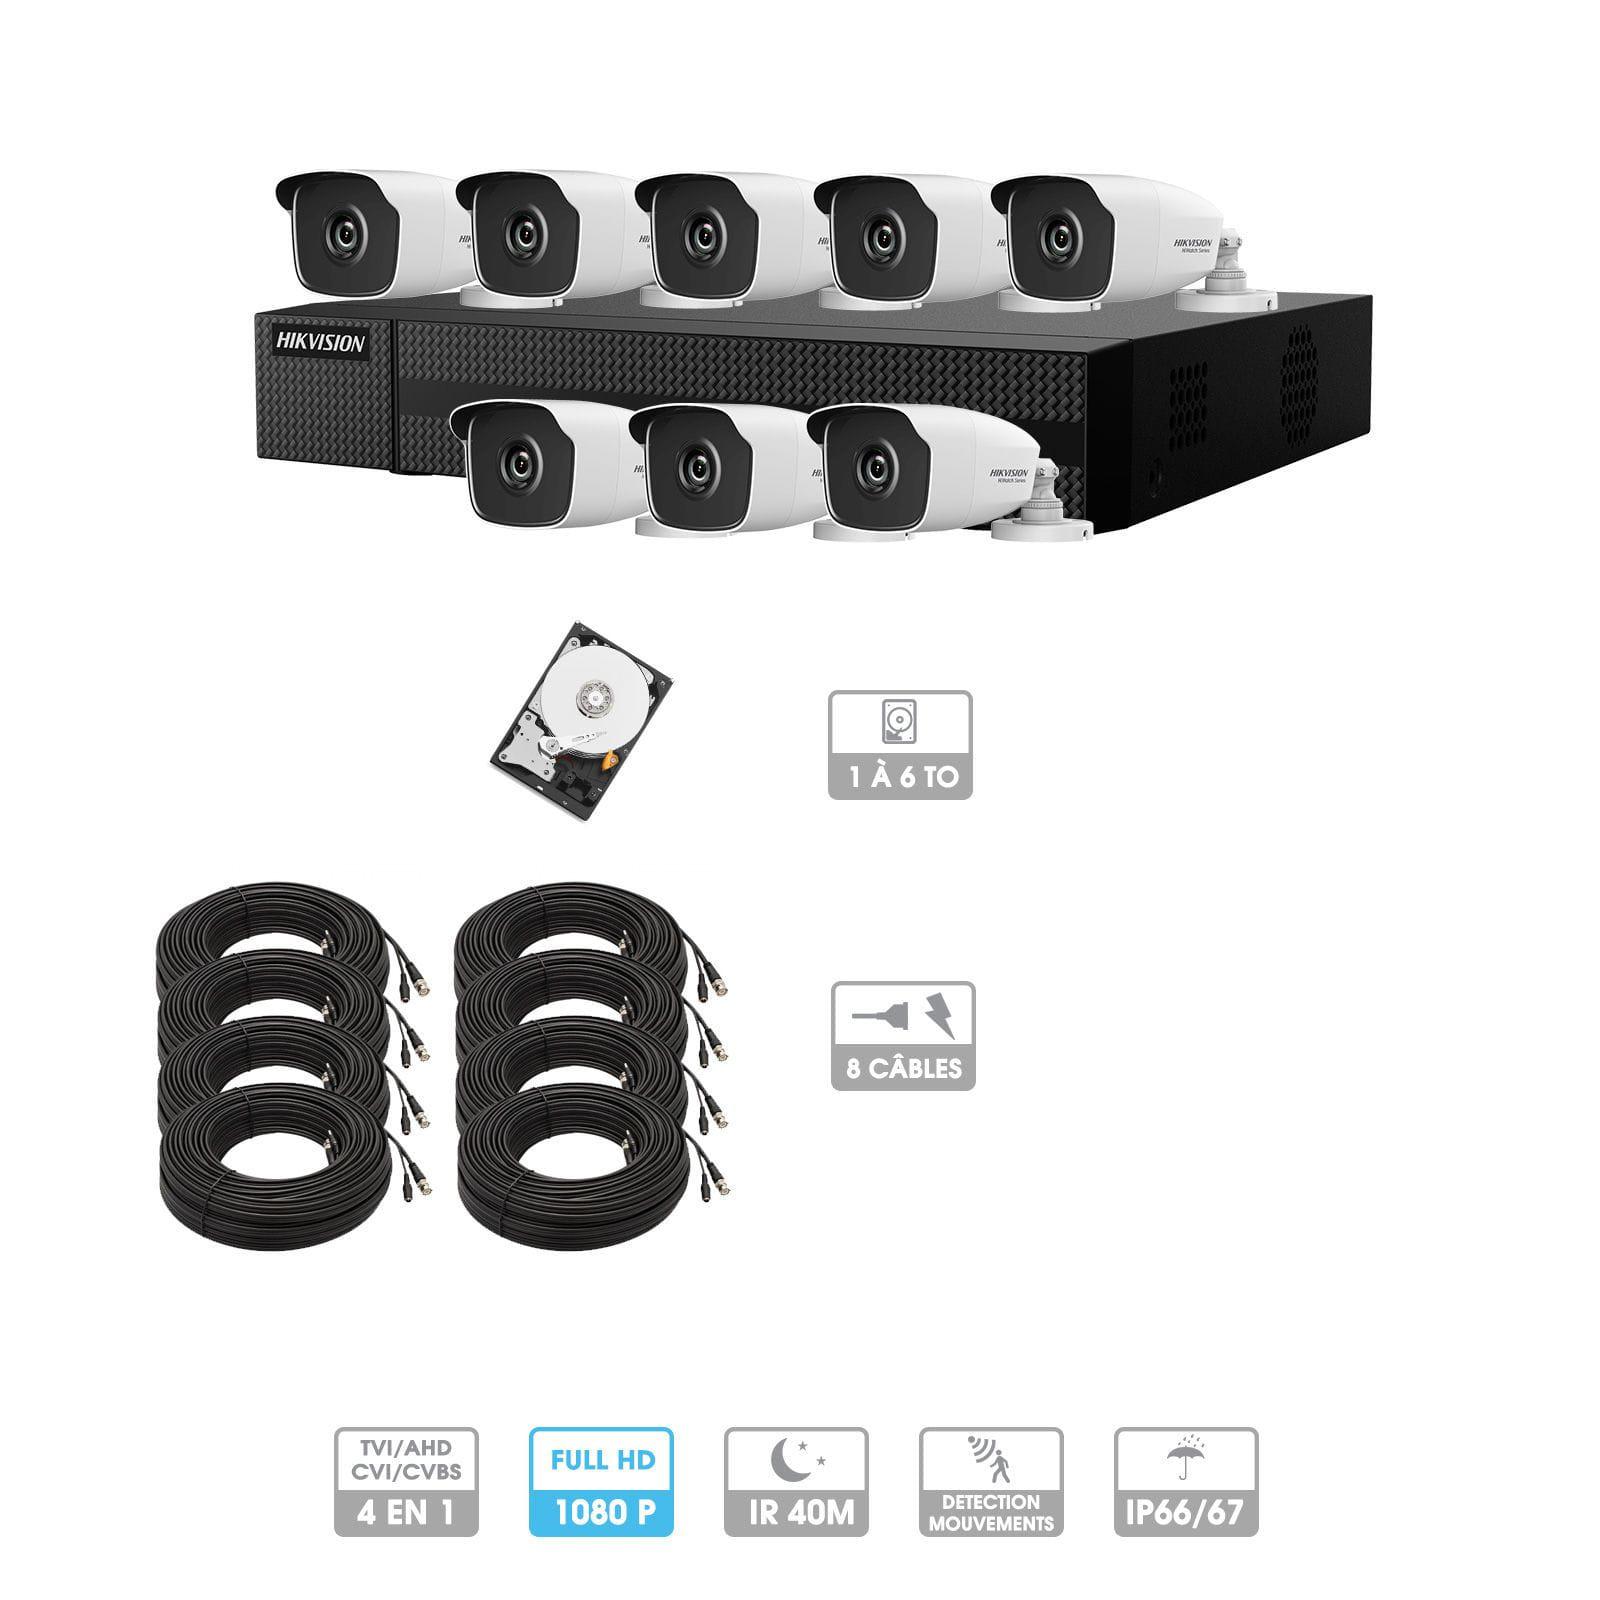 Kit vidéosurveillance 8 caméras 1080P HD | 8 câbles 20 mètres | HDD 1To | Tubes Hiwatch